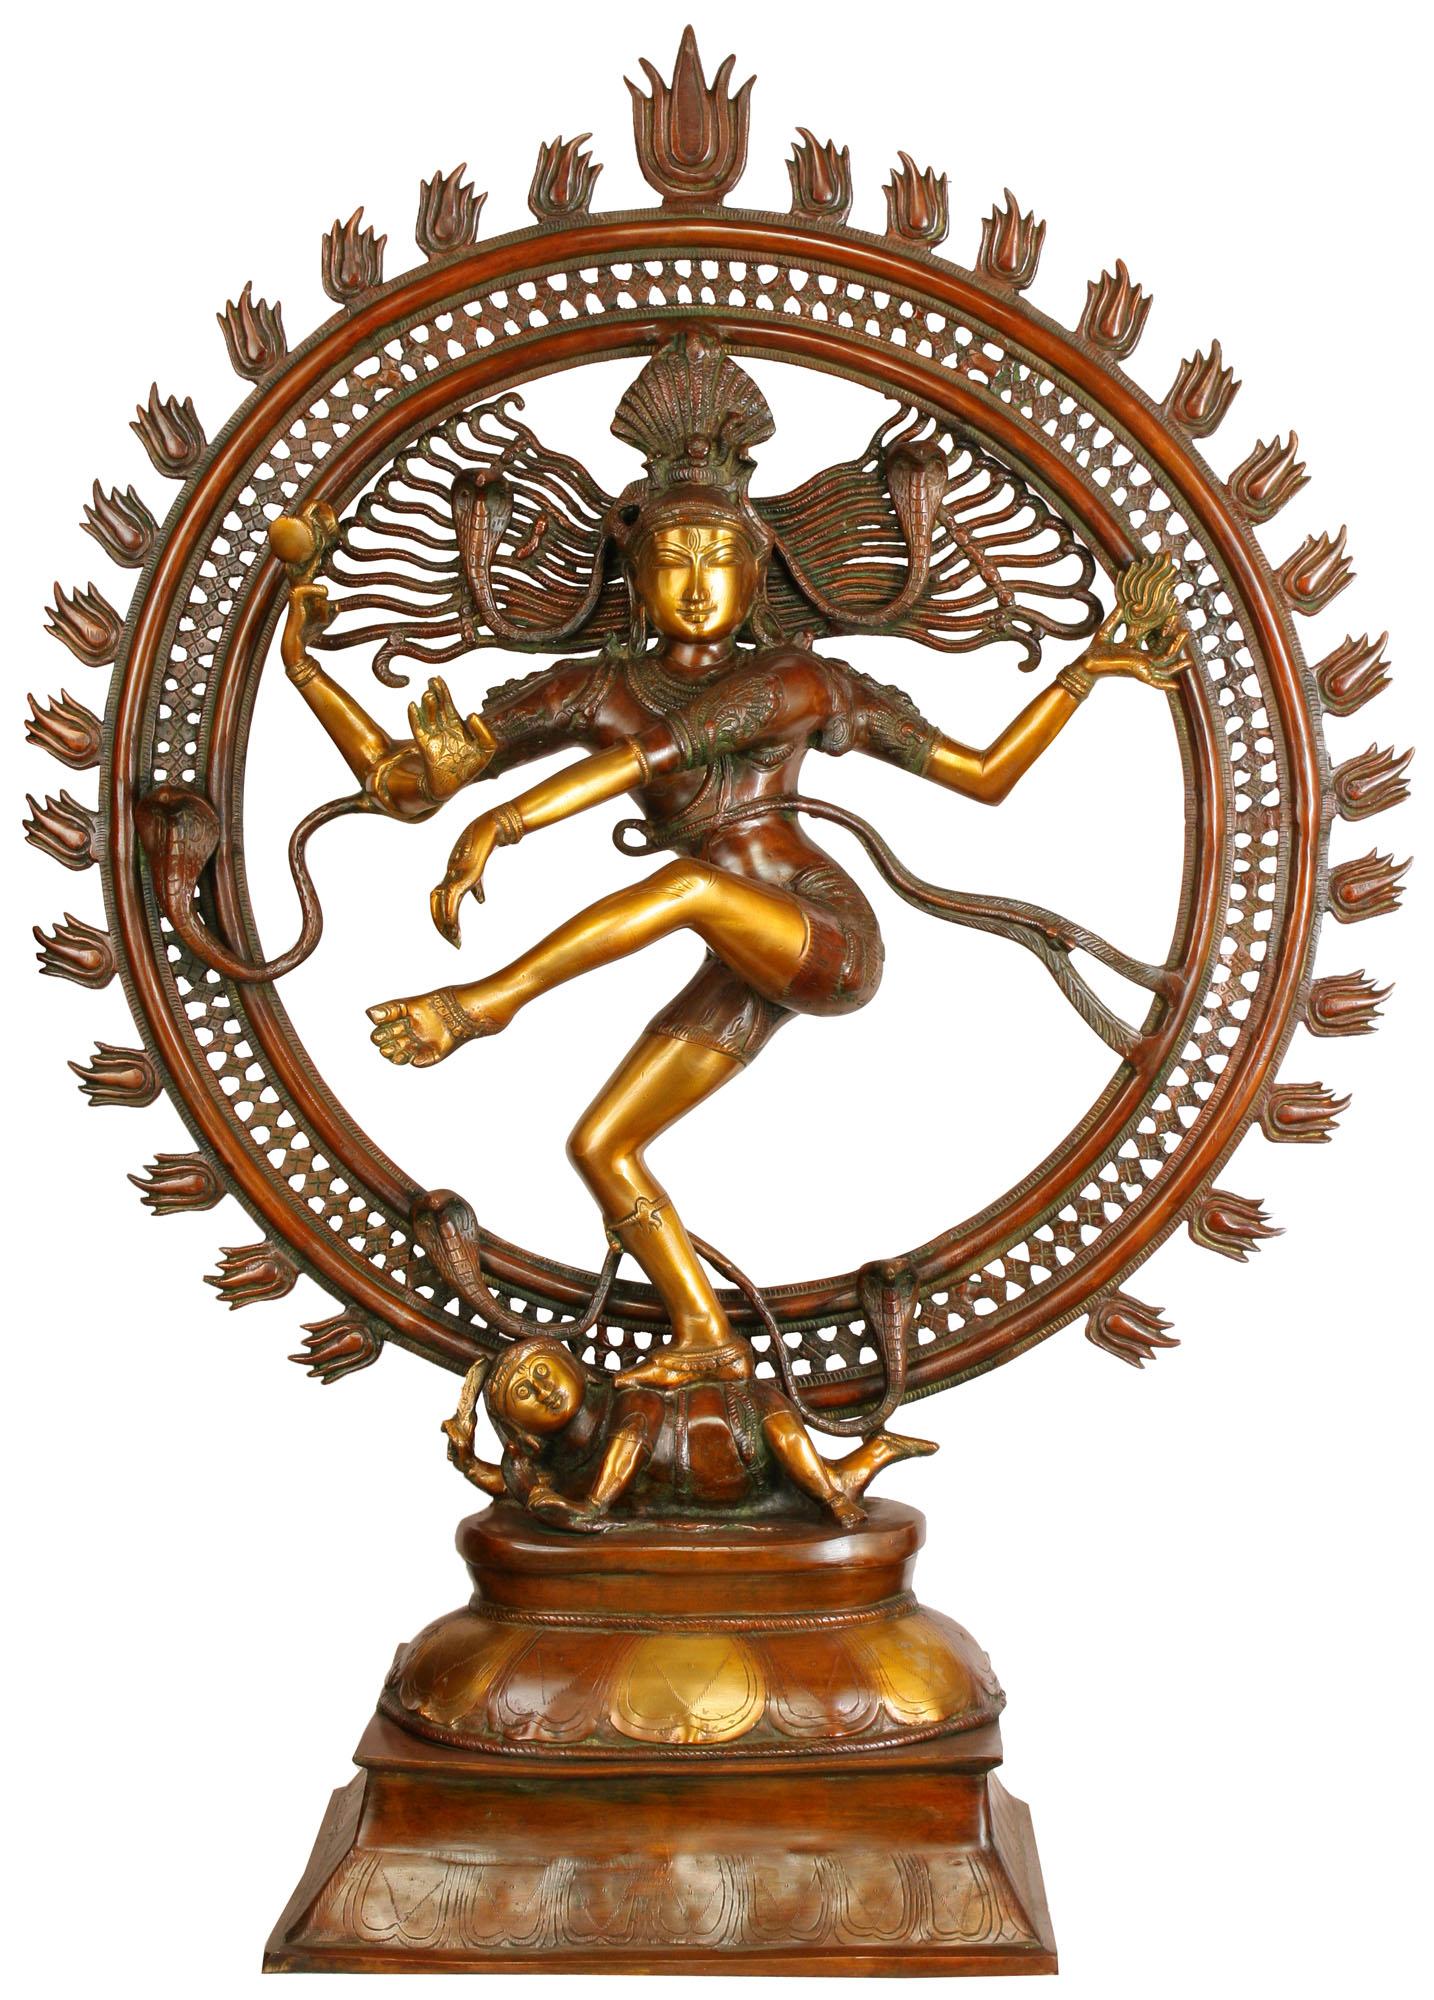 Lord Shiva as Nataraja (Large Statue).